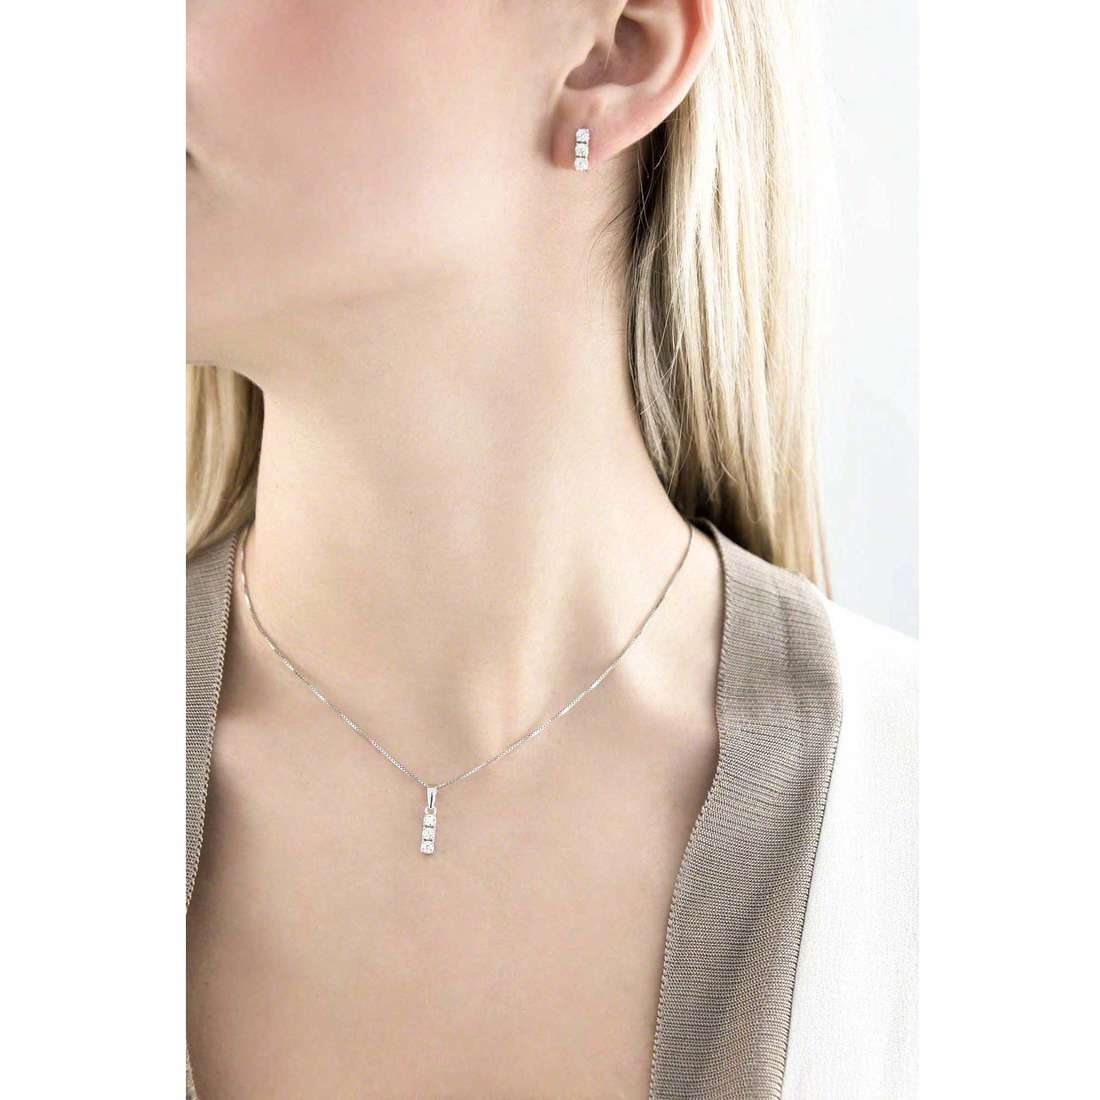 GioiaPura colliers femme 32349-01-00 indosso